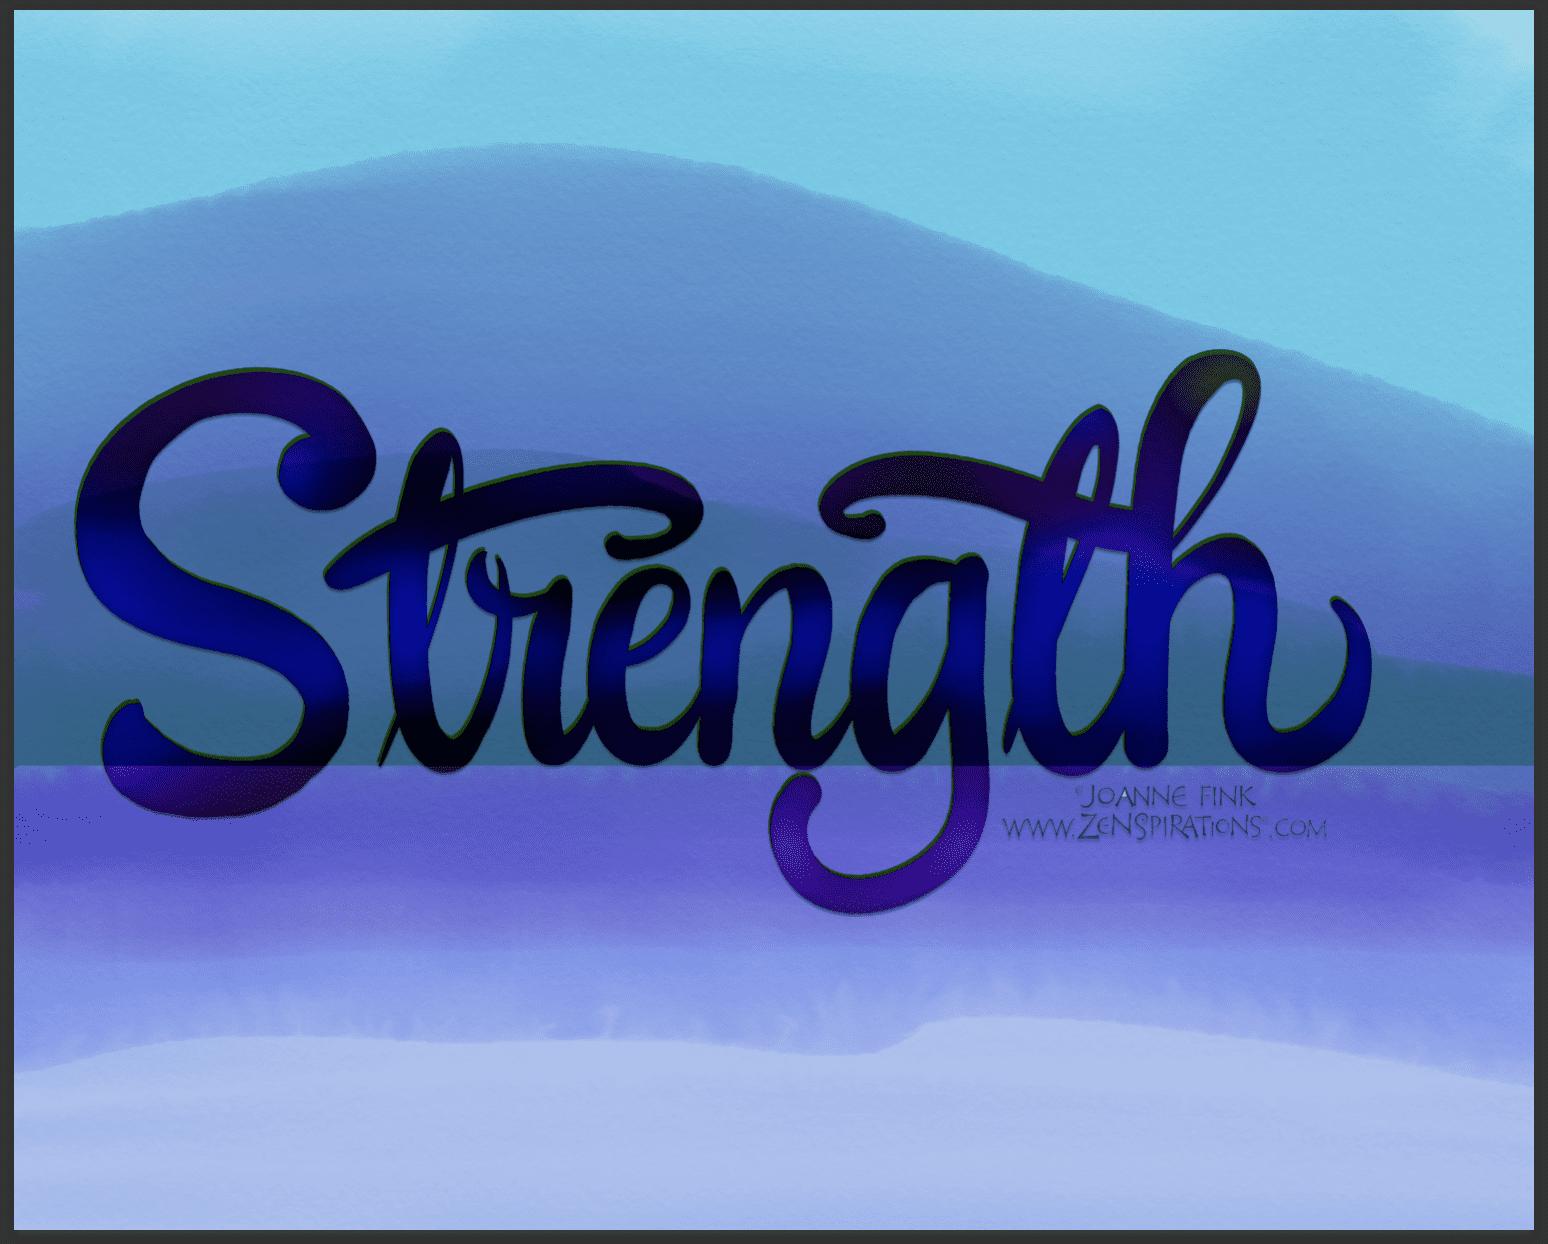 zenspirations_by_joanne_fink_new_year_blog_2016_strength